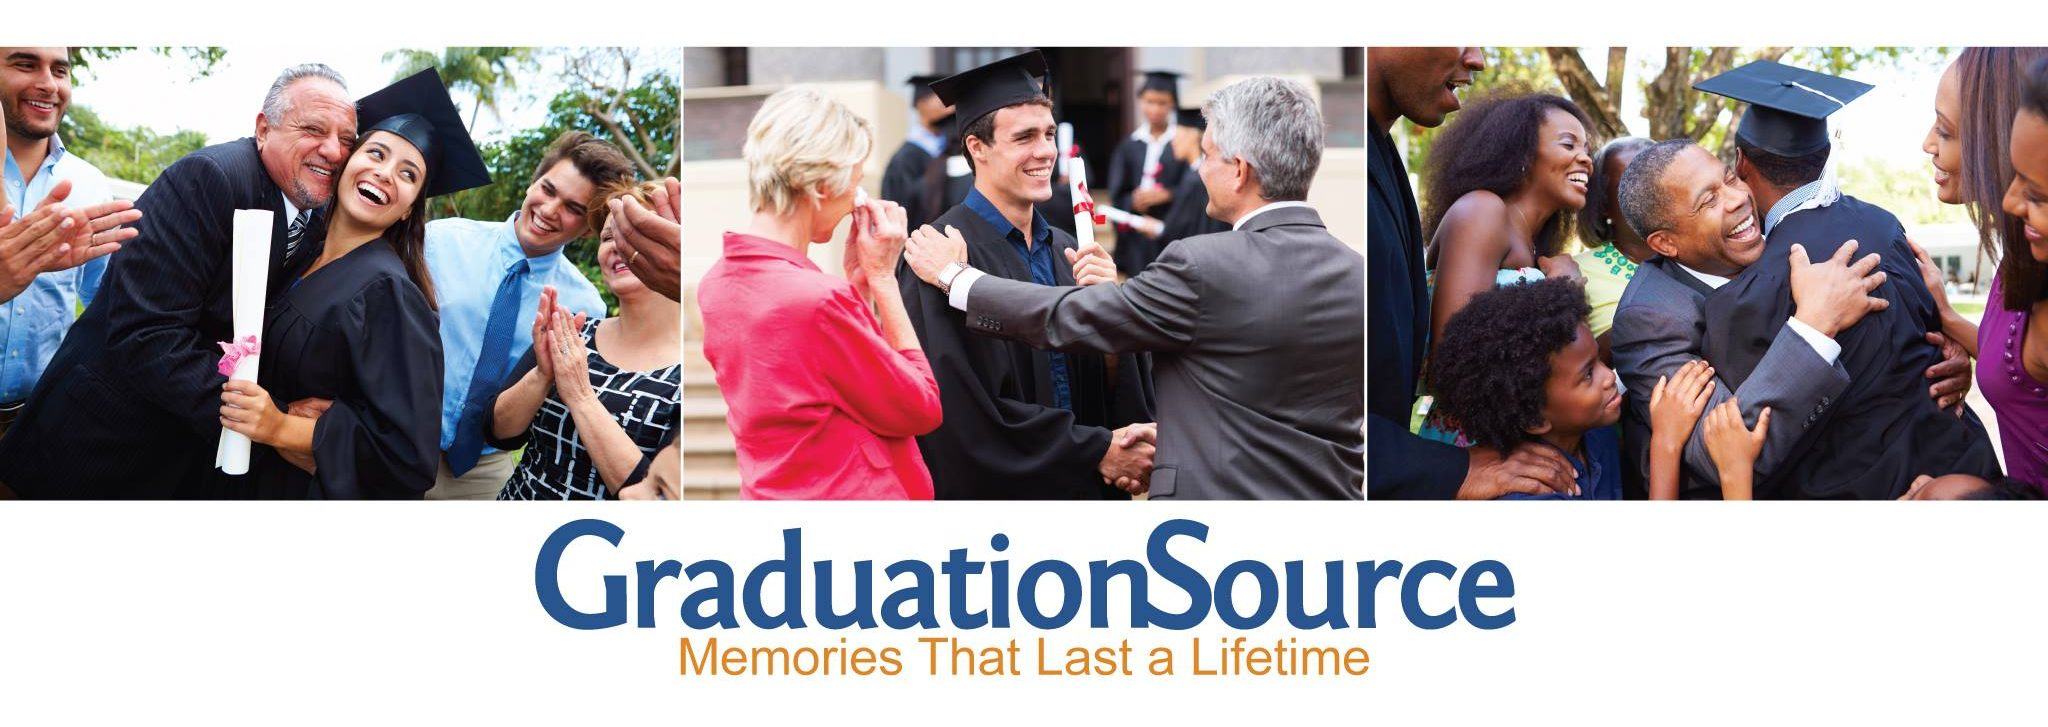 #Graduation #GraduationSource #parenting #ad